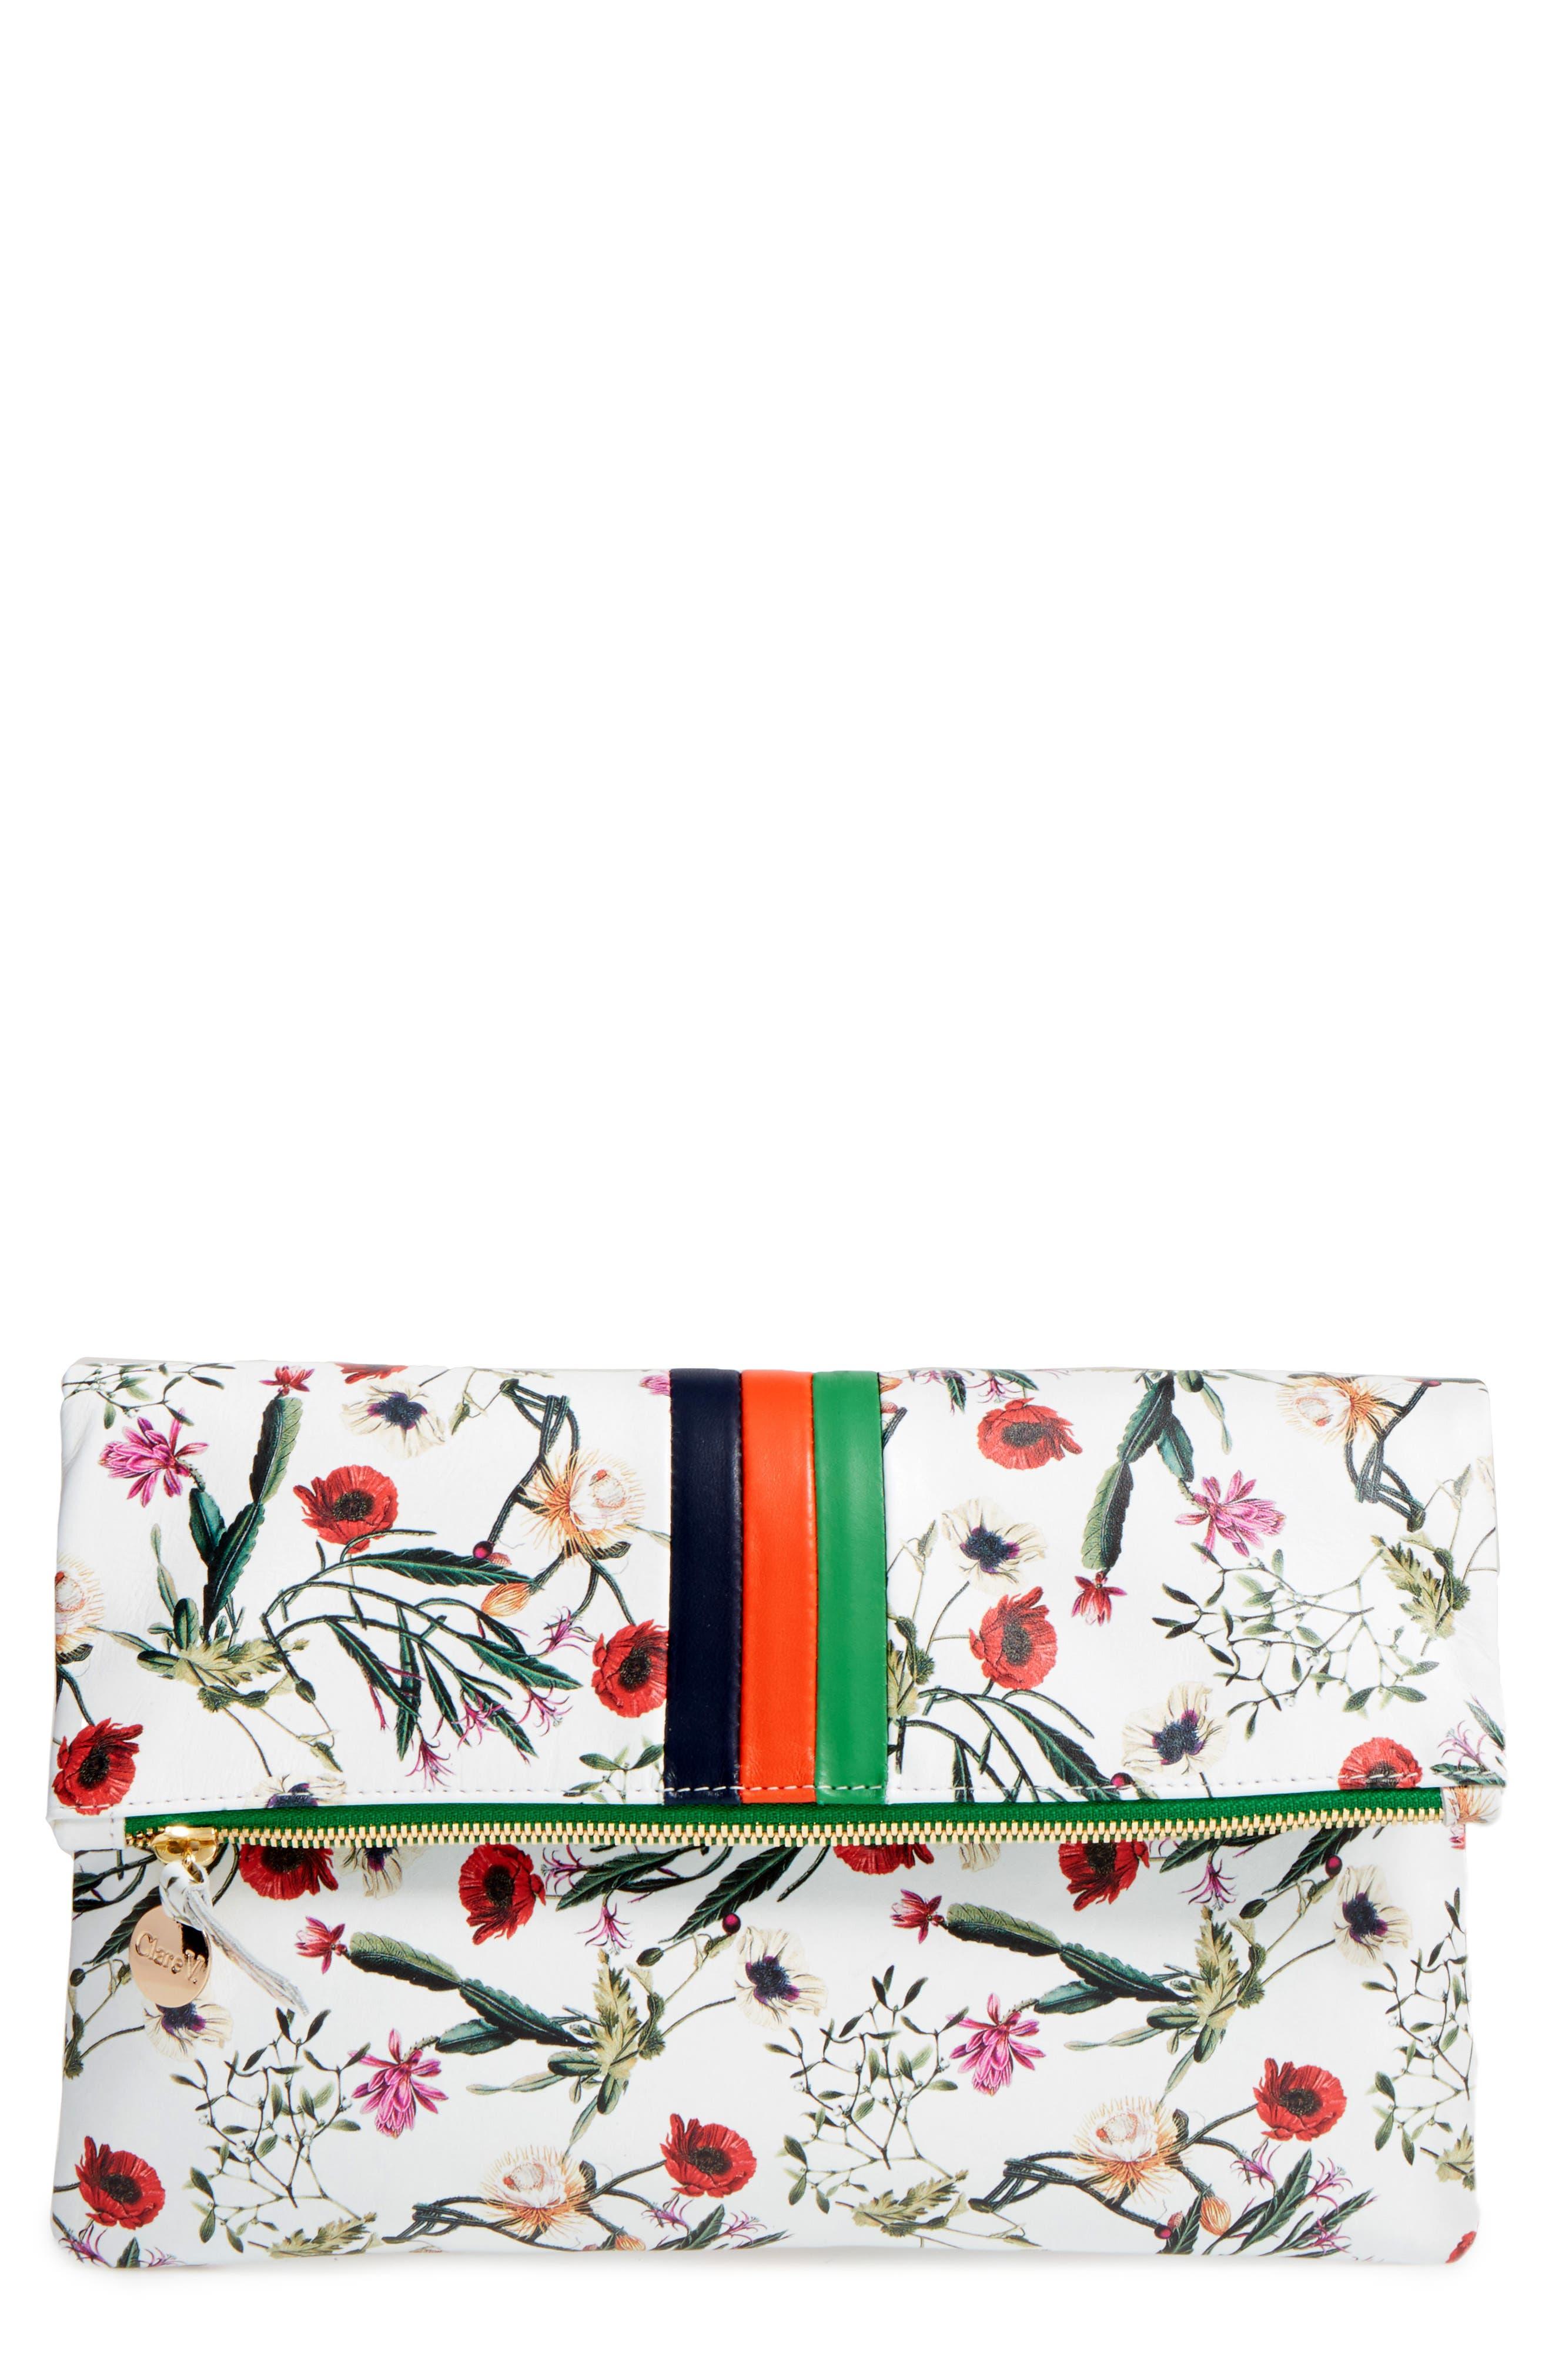 Alternate Image 1 Selected - Clare V. Floral Leather Foldover Clutch